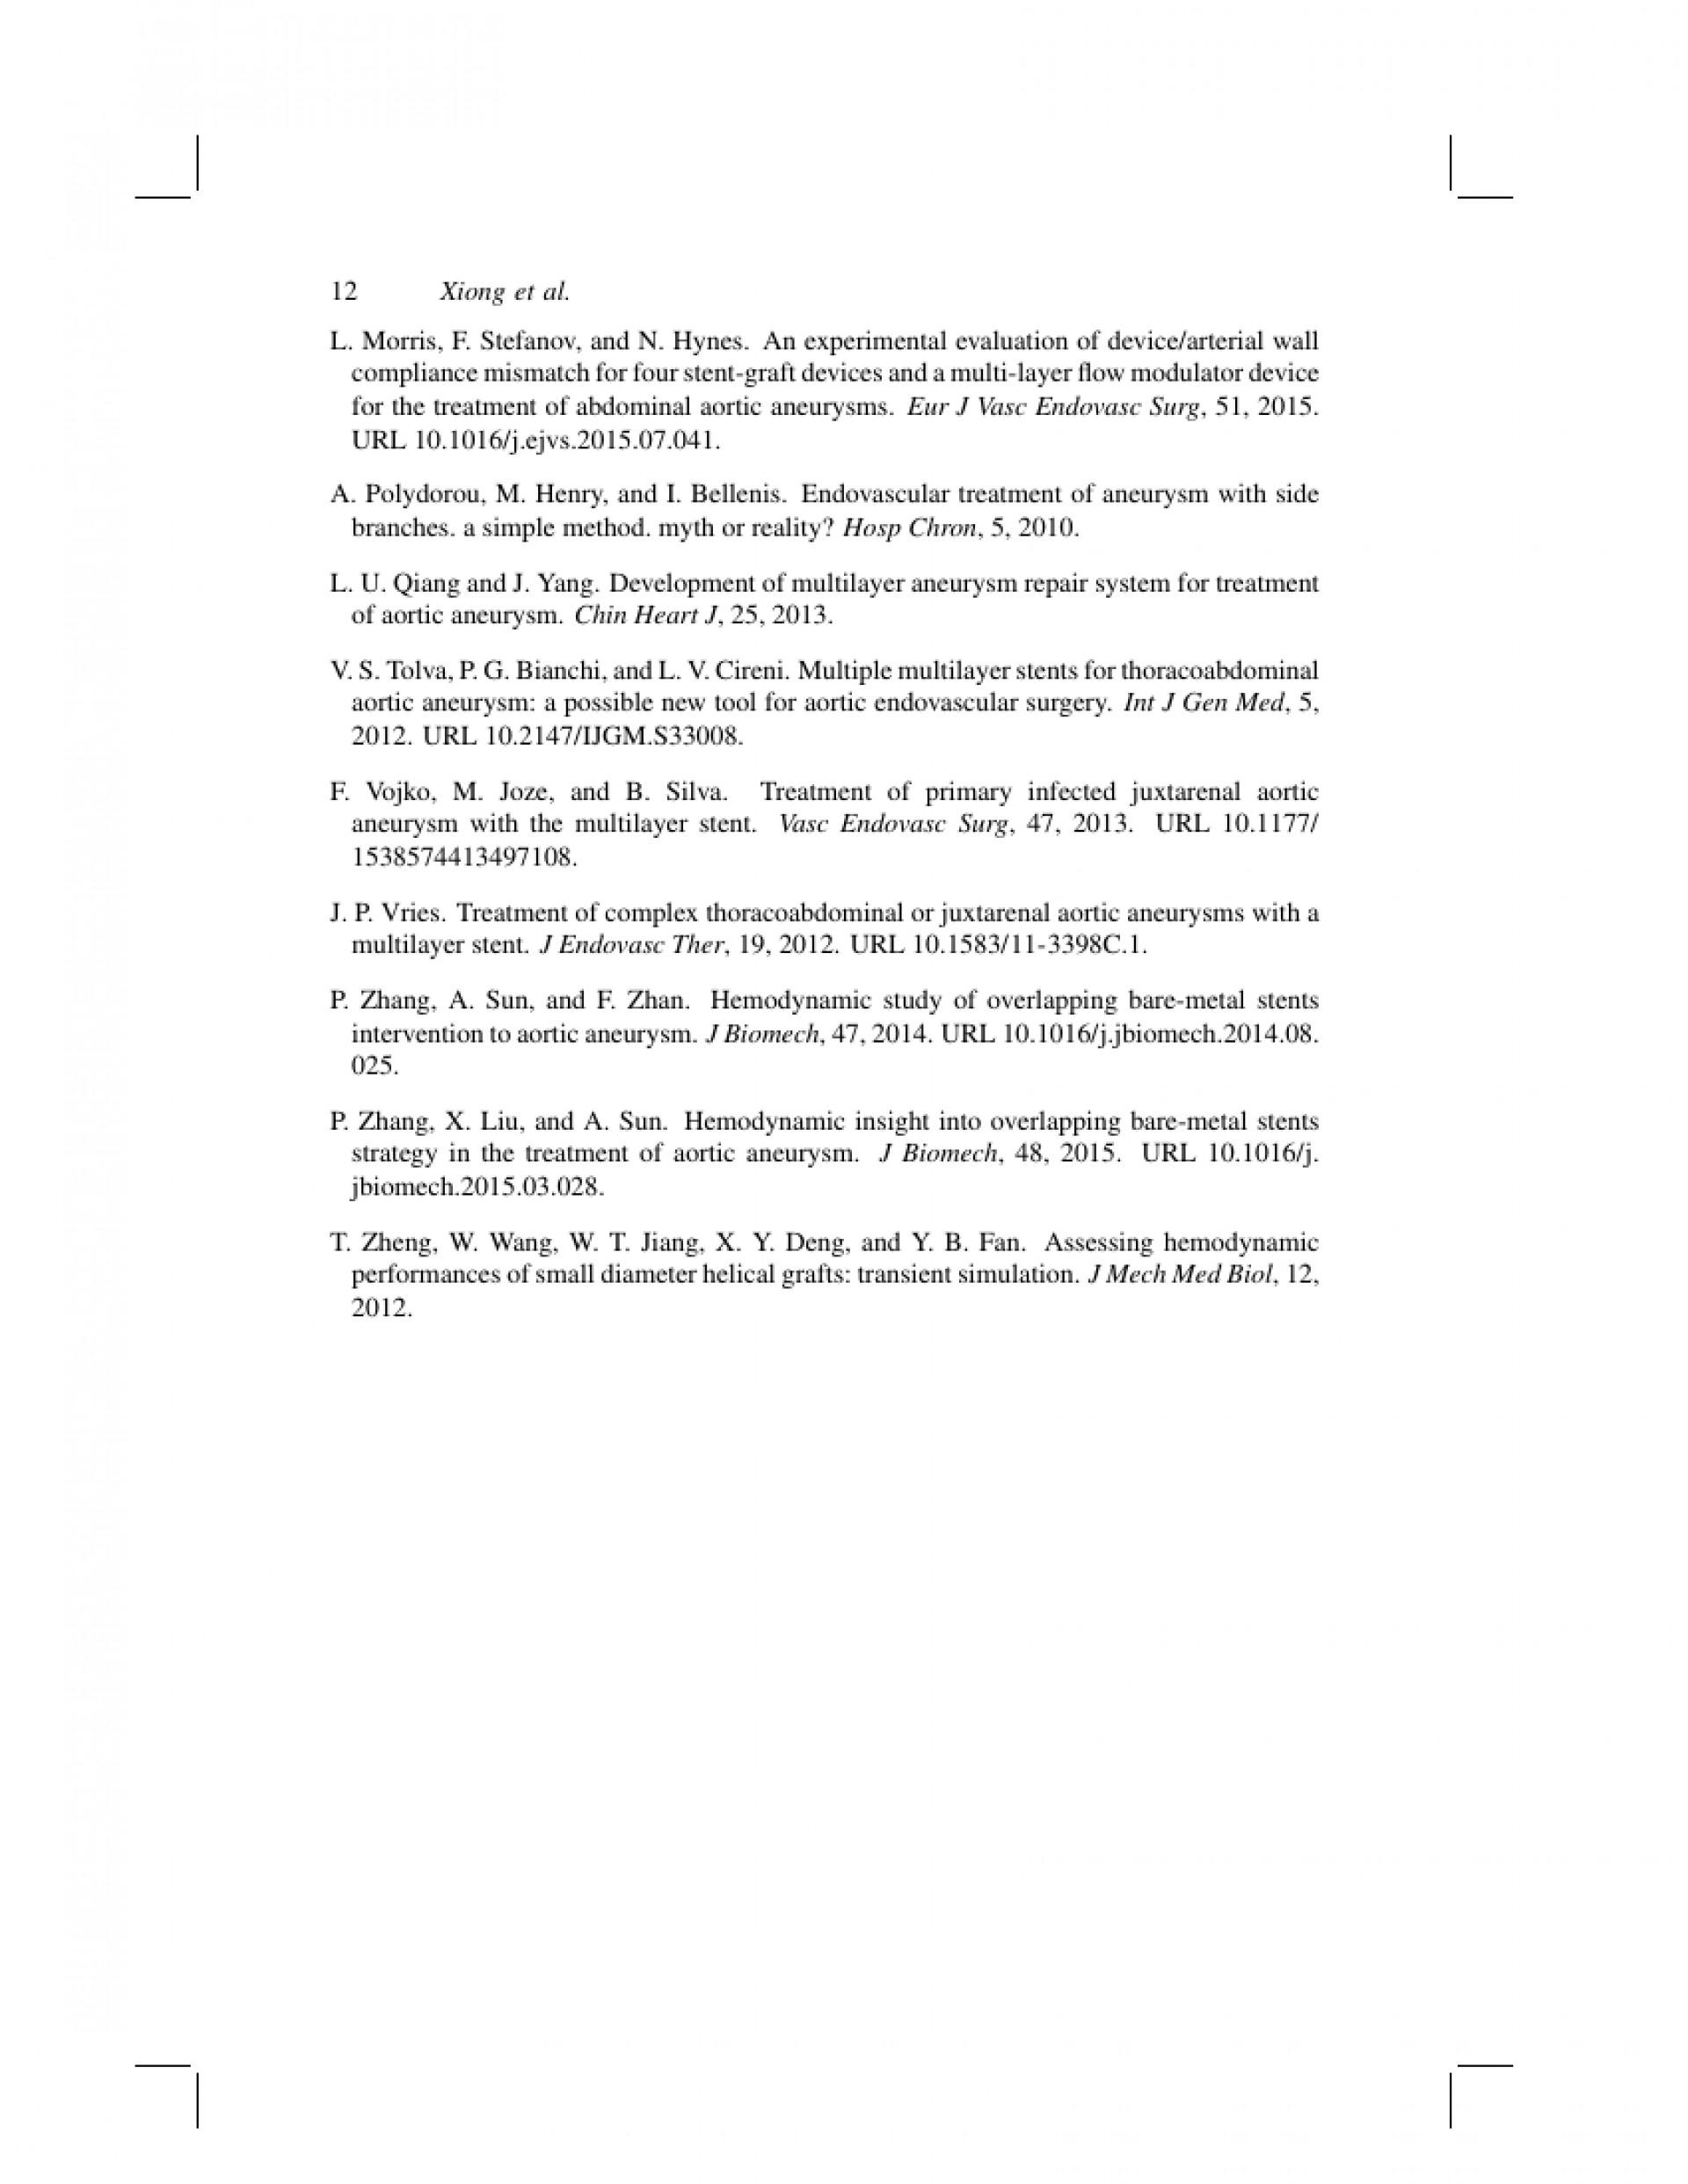 018 Toefl Ibt Essay Topics Output Striking 2015 1920